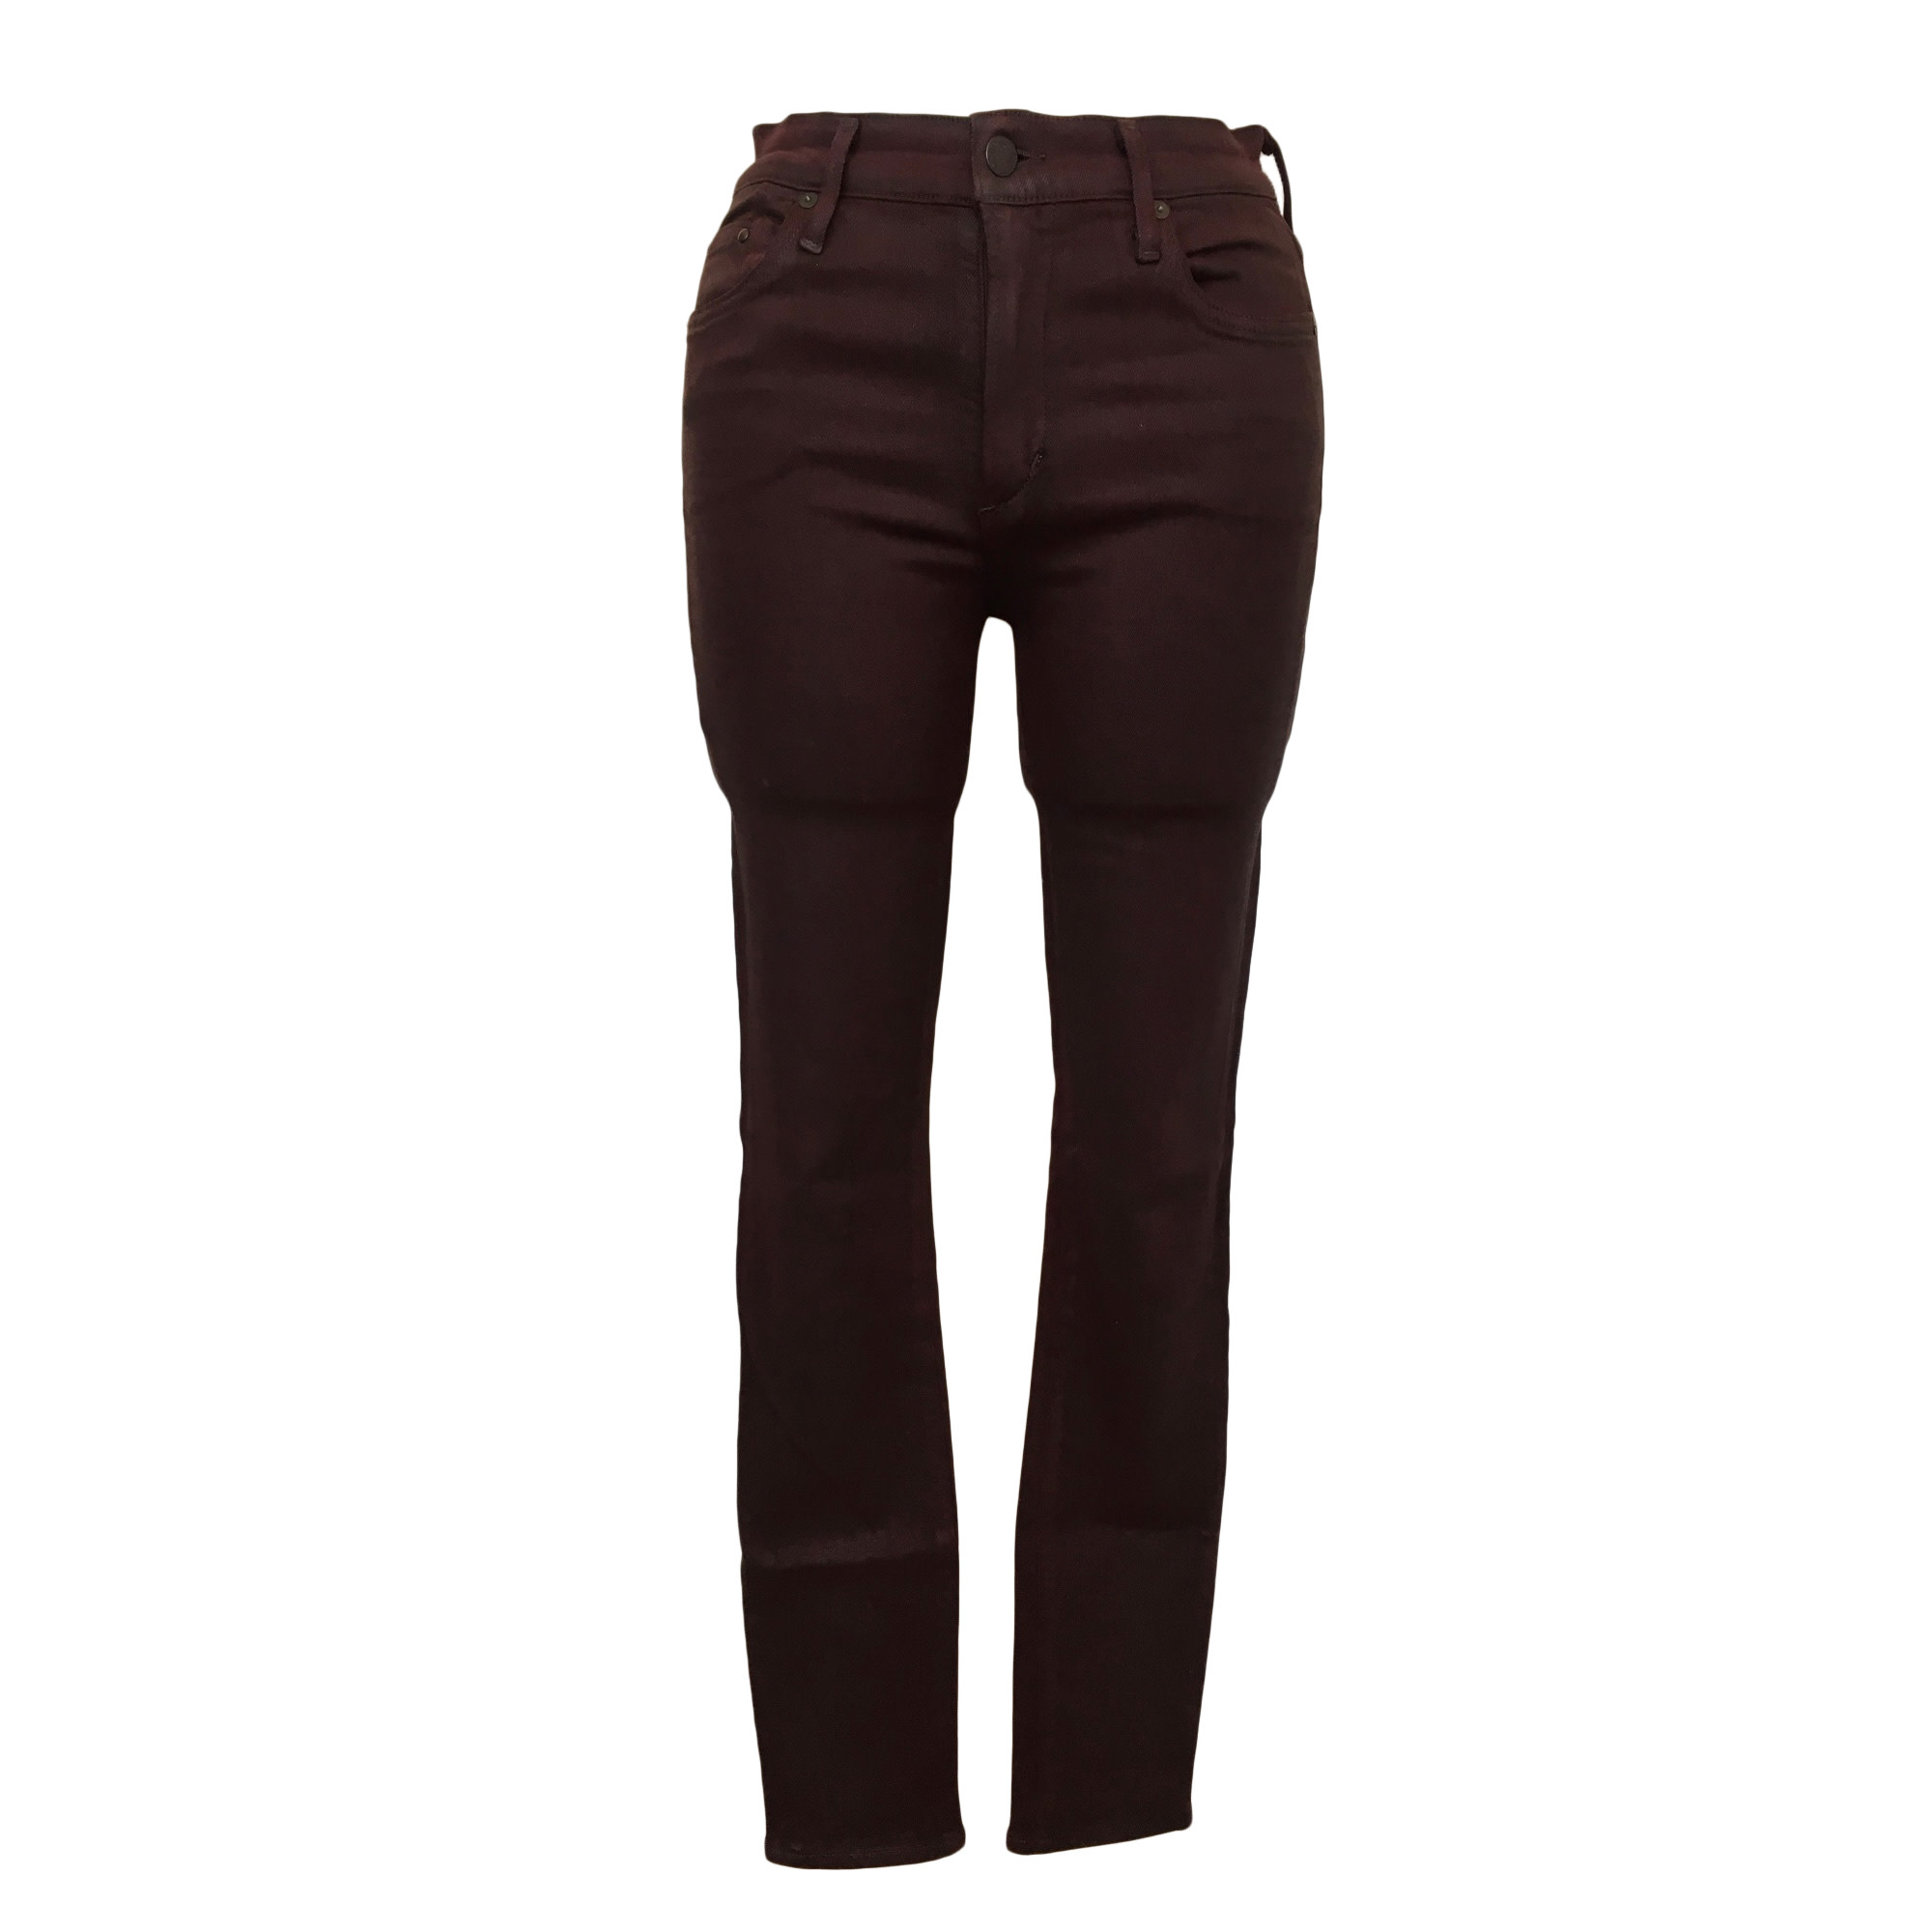 Jeans slim CITIZENS OF HUMANITY Rouge, bordeaux